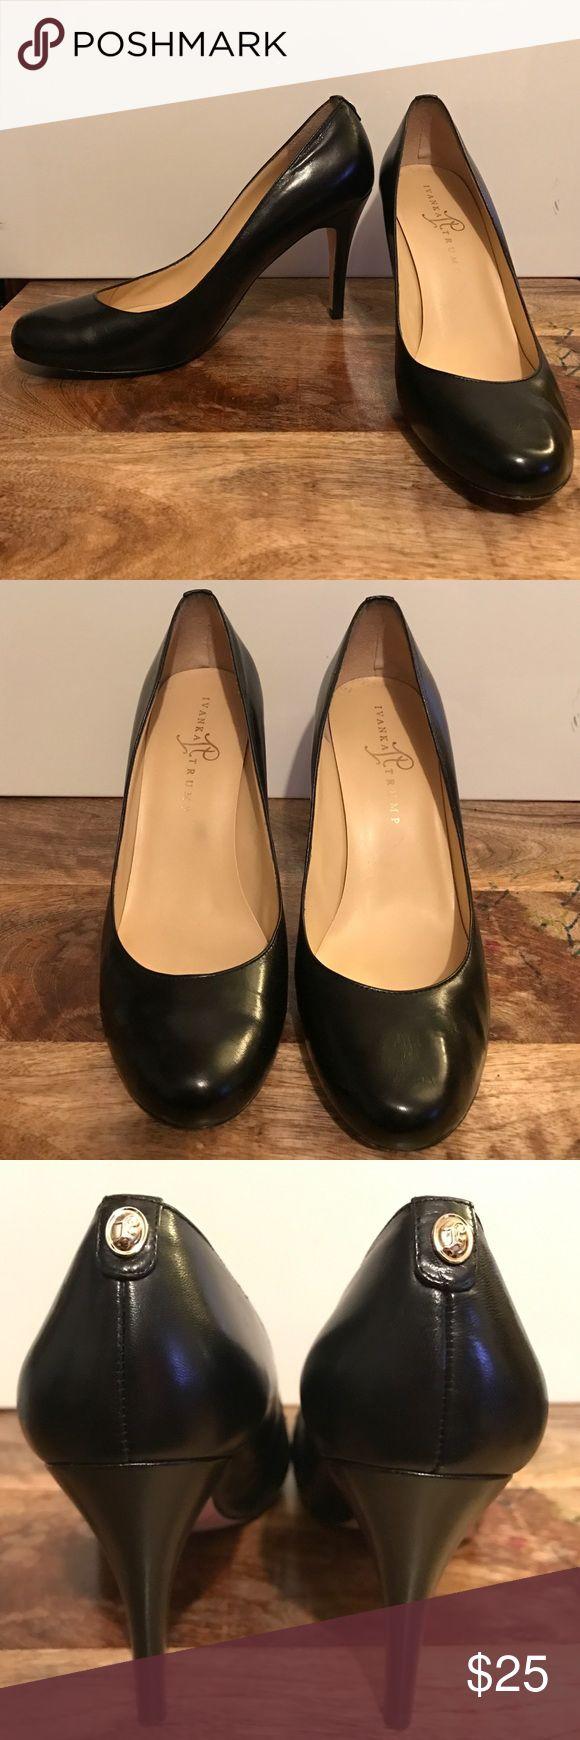 Ivank Trump black pumps Black round toe pumps. Gently used. Ivanka Trump Shoes Heels